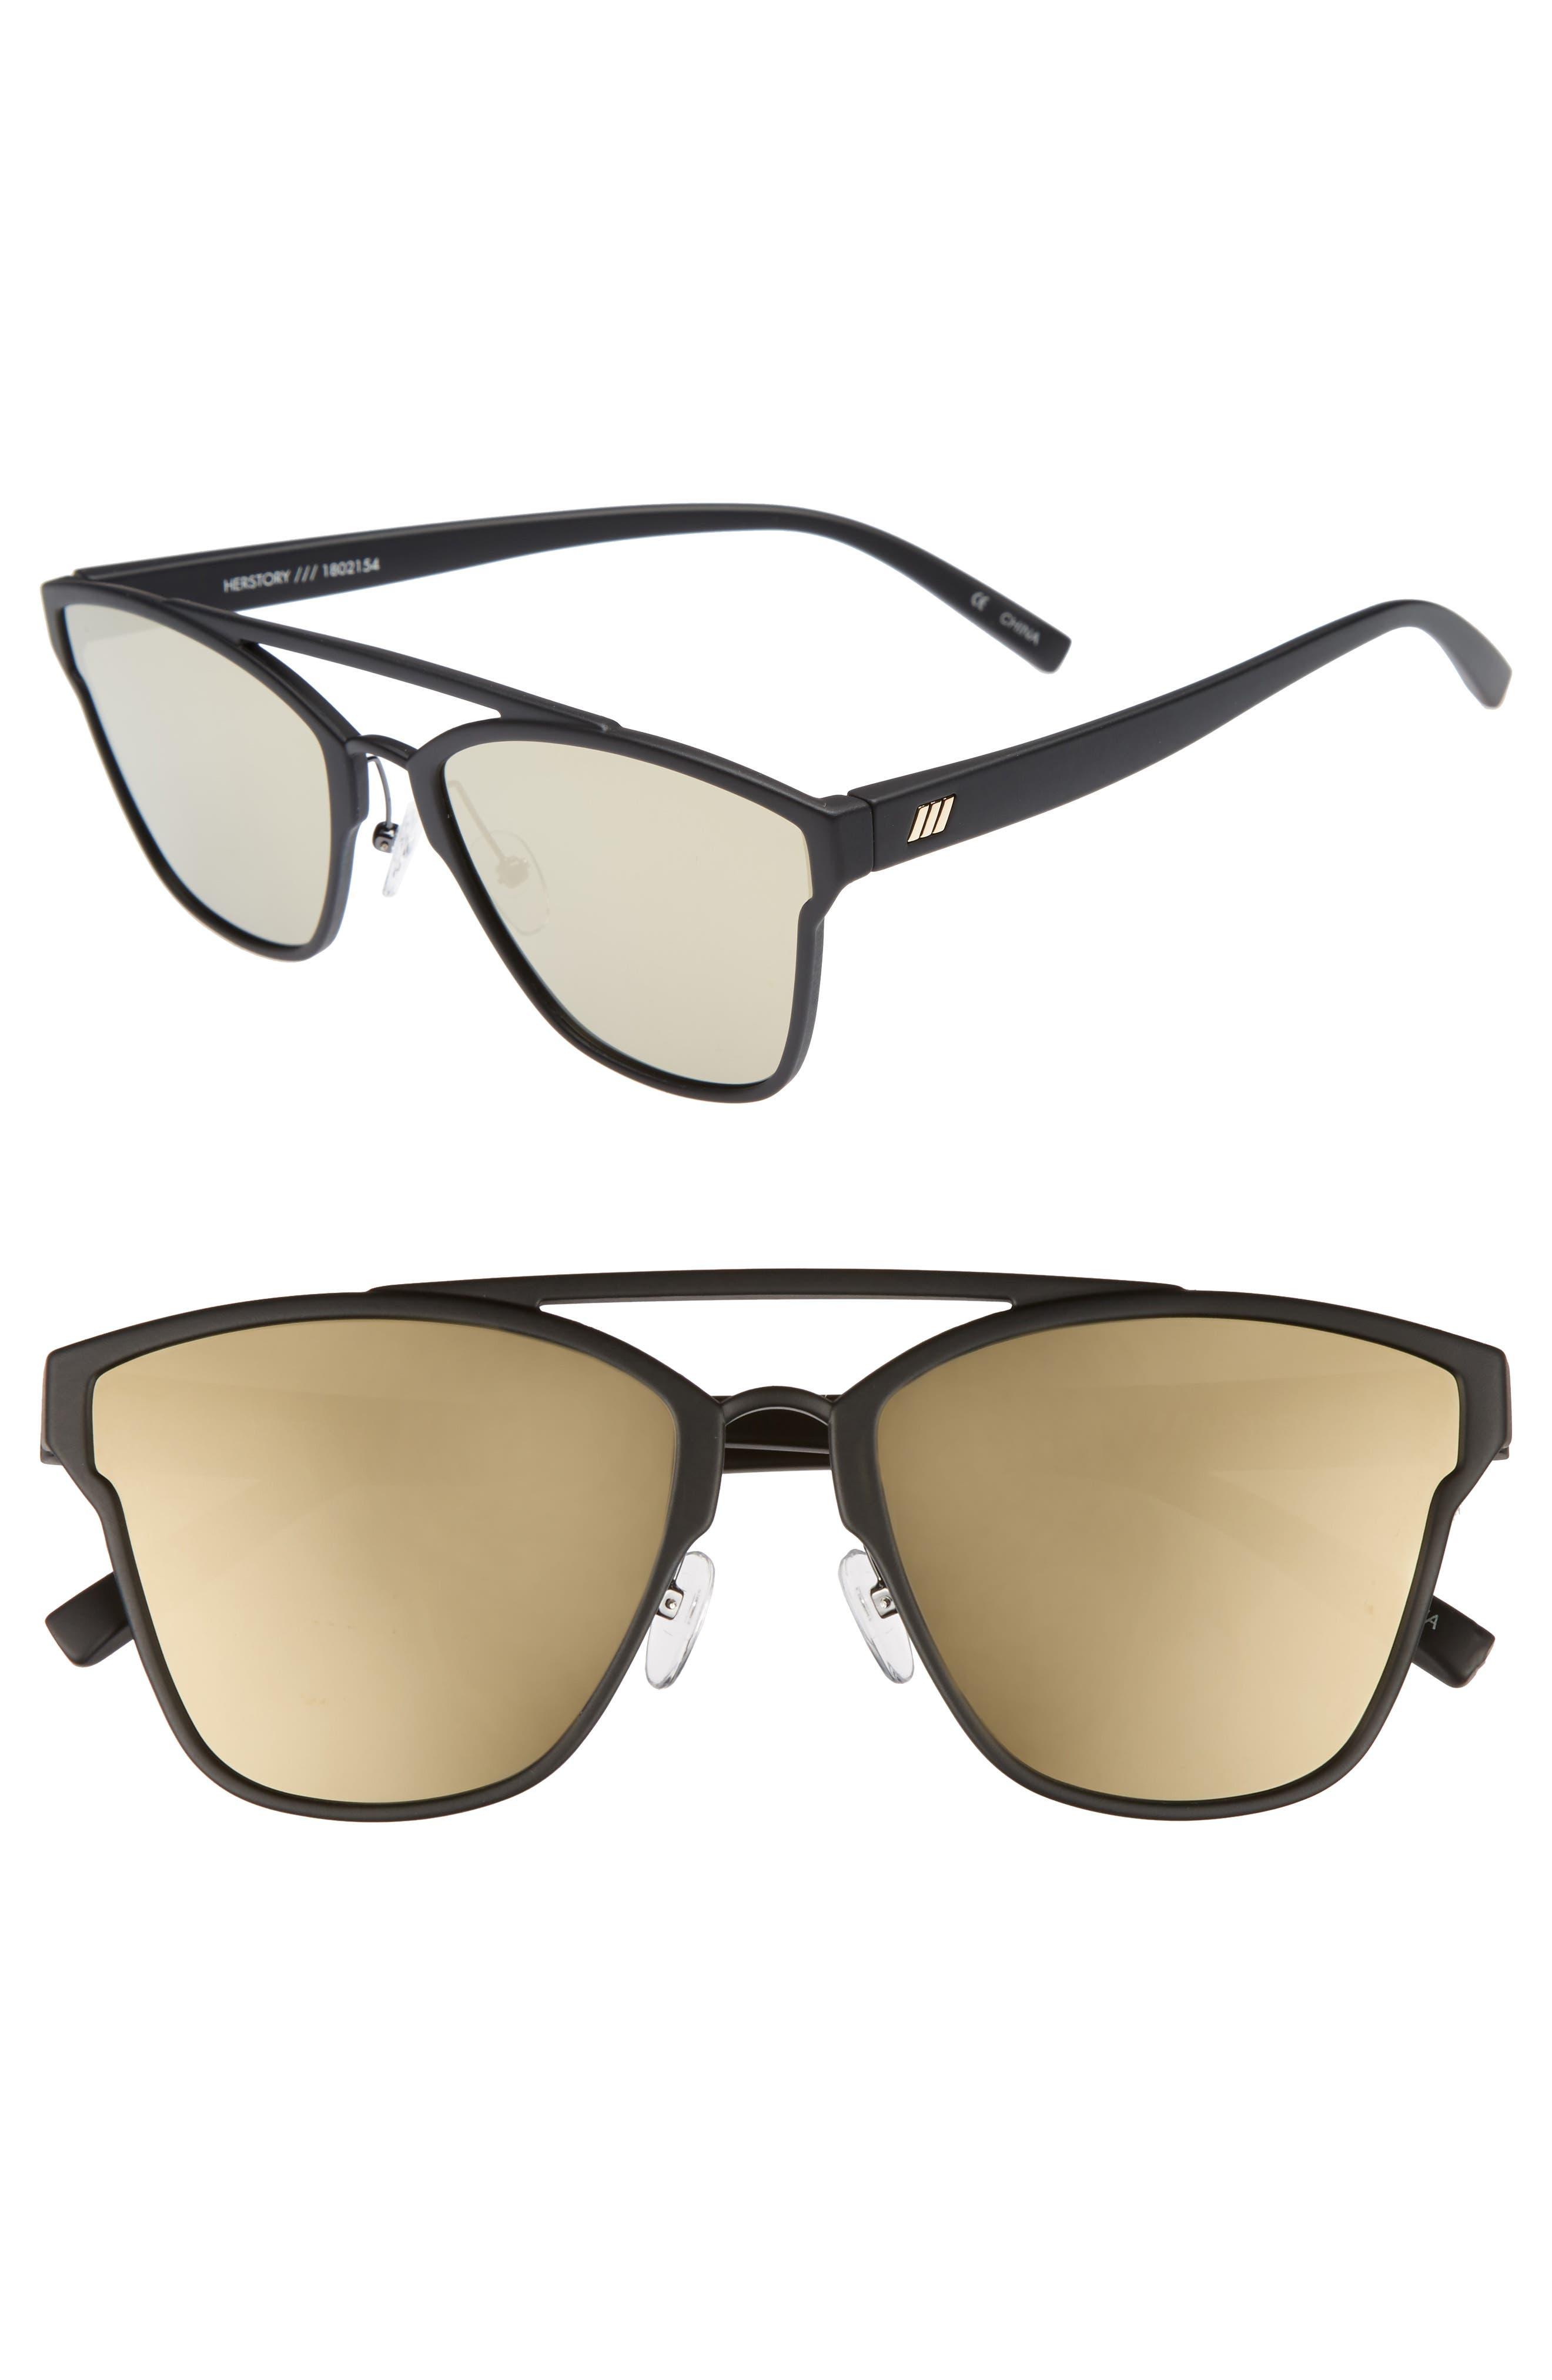 Herstory 55mm Aviator Sunglasses,                         Main,                         color, Black Rubber